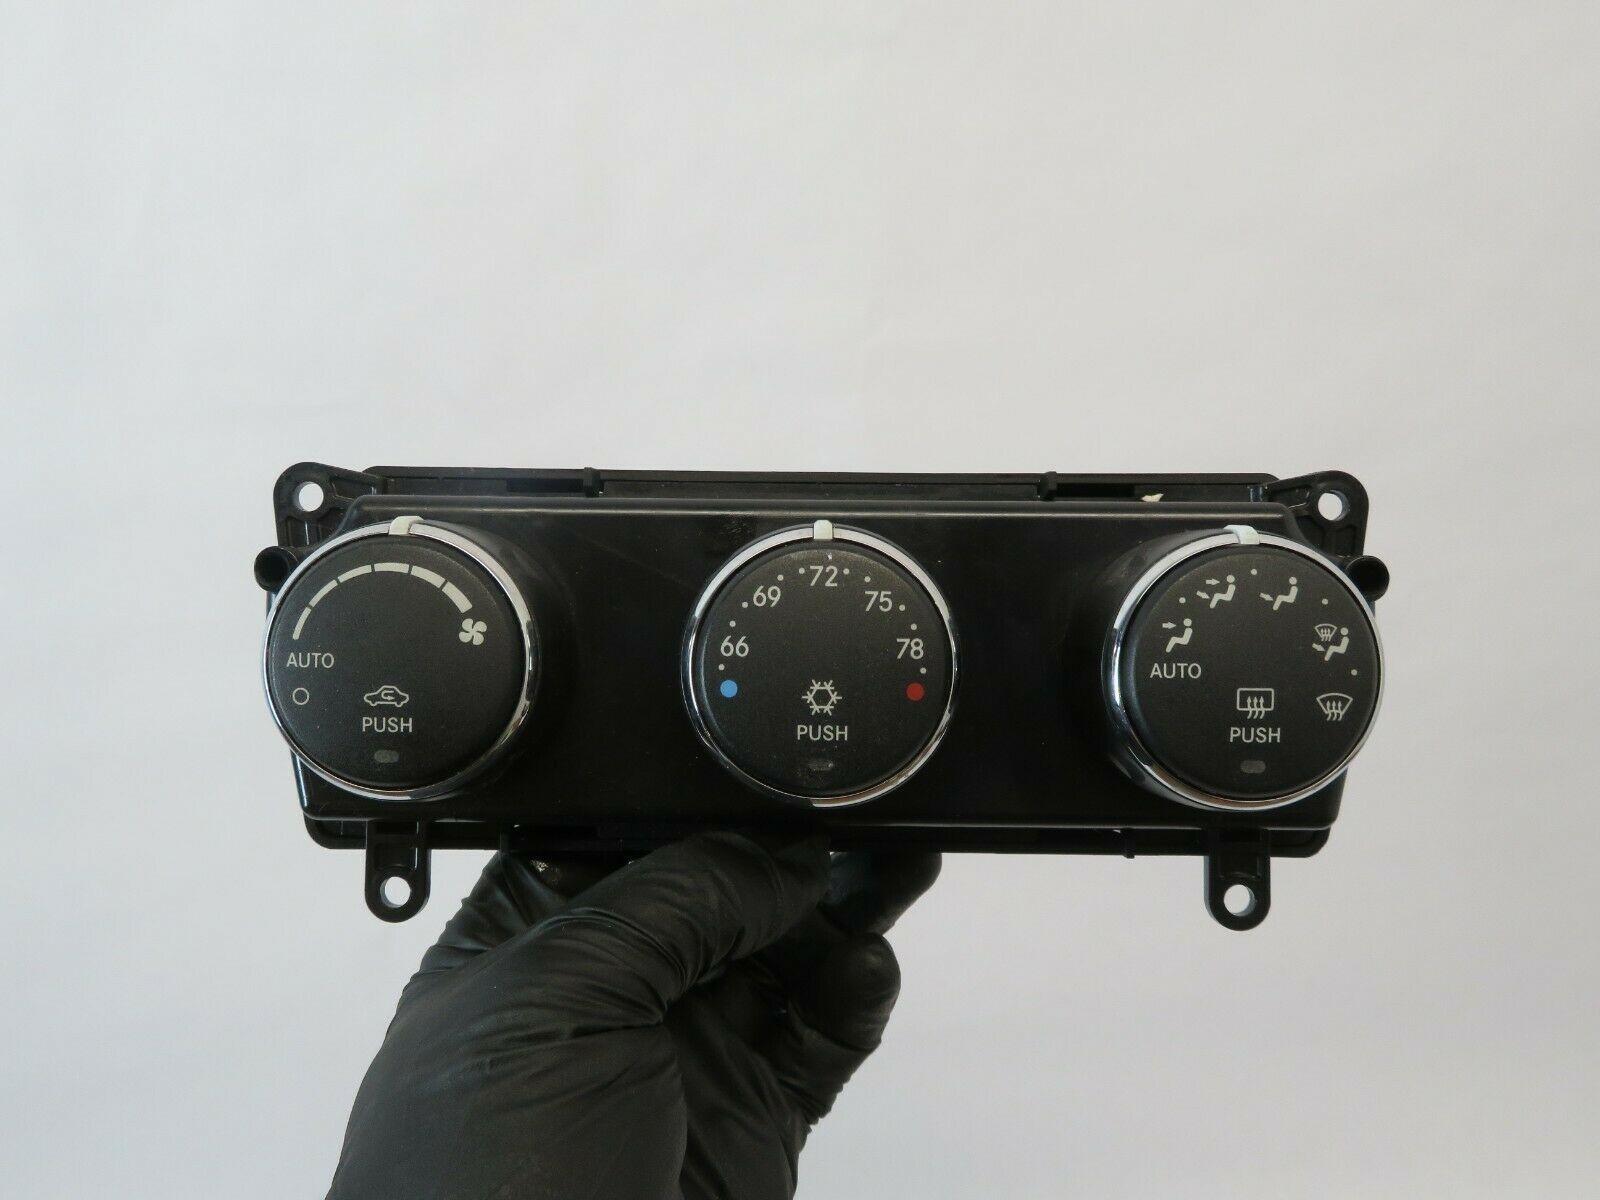 #3945B CHRYSLER 200 11 12 13 14 OEM DASH TEMP AC HEAT AIR CLIMATE CONTROL SWITCH - $11.88